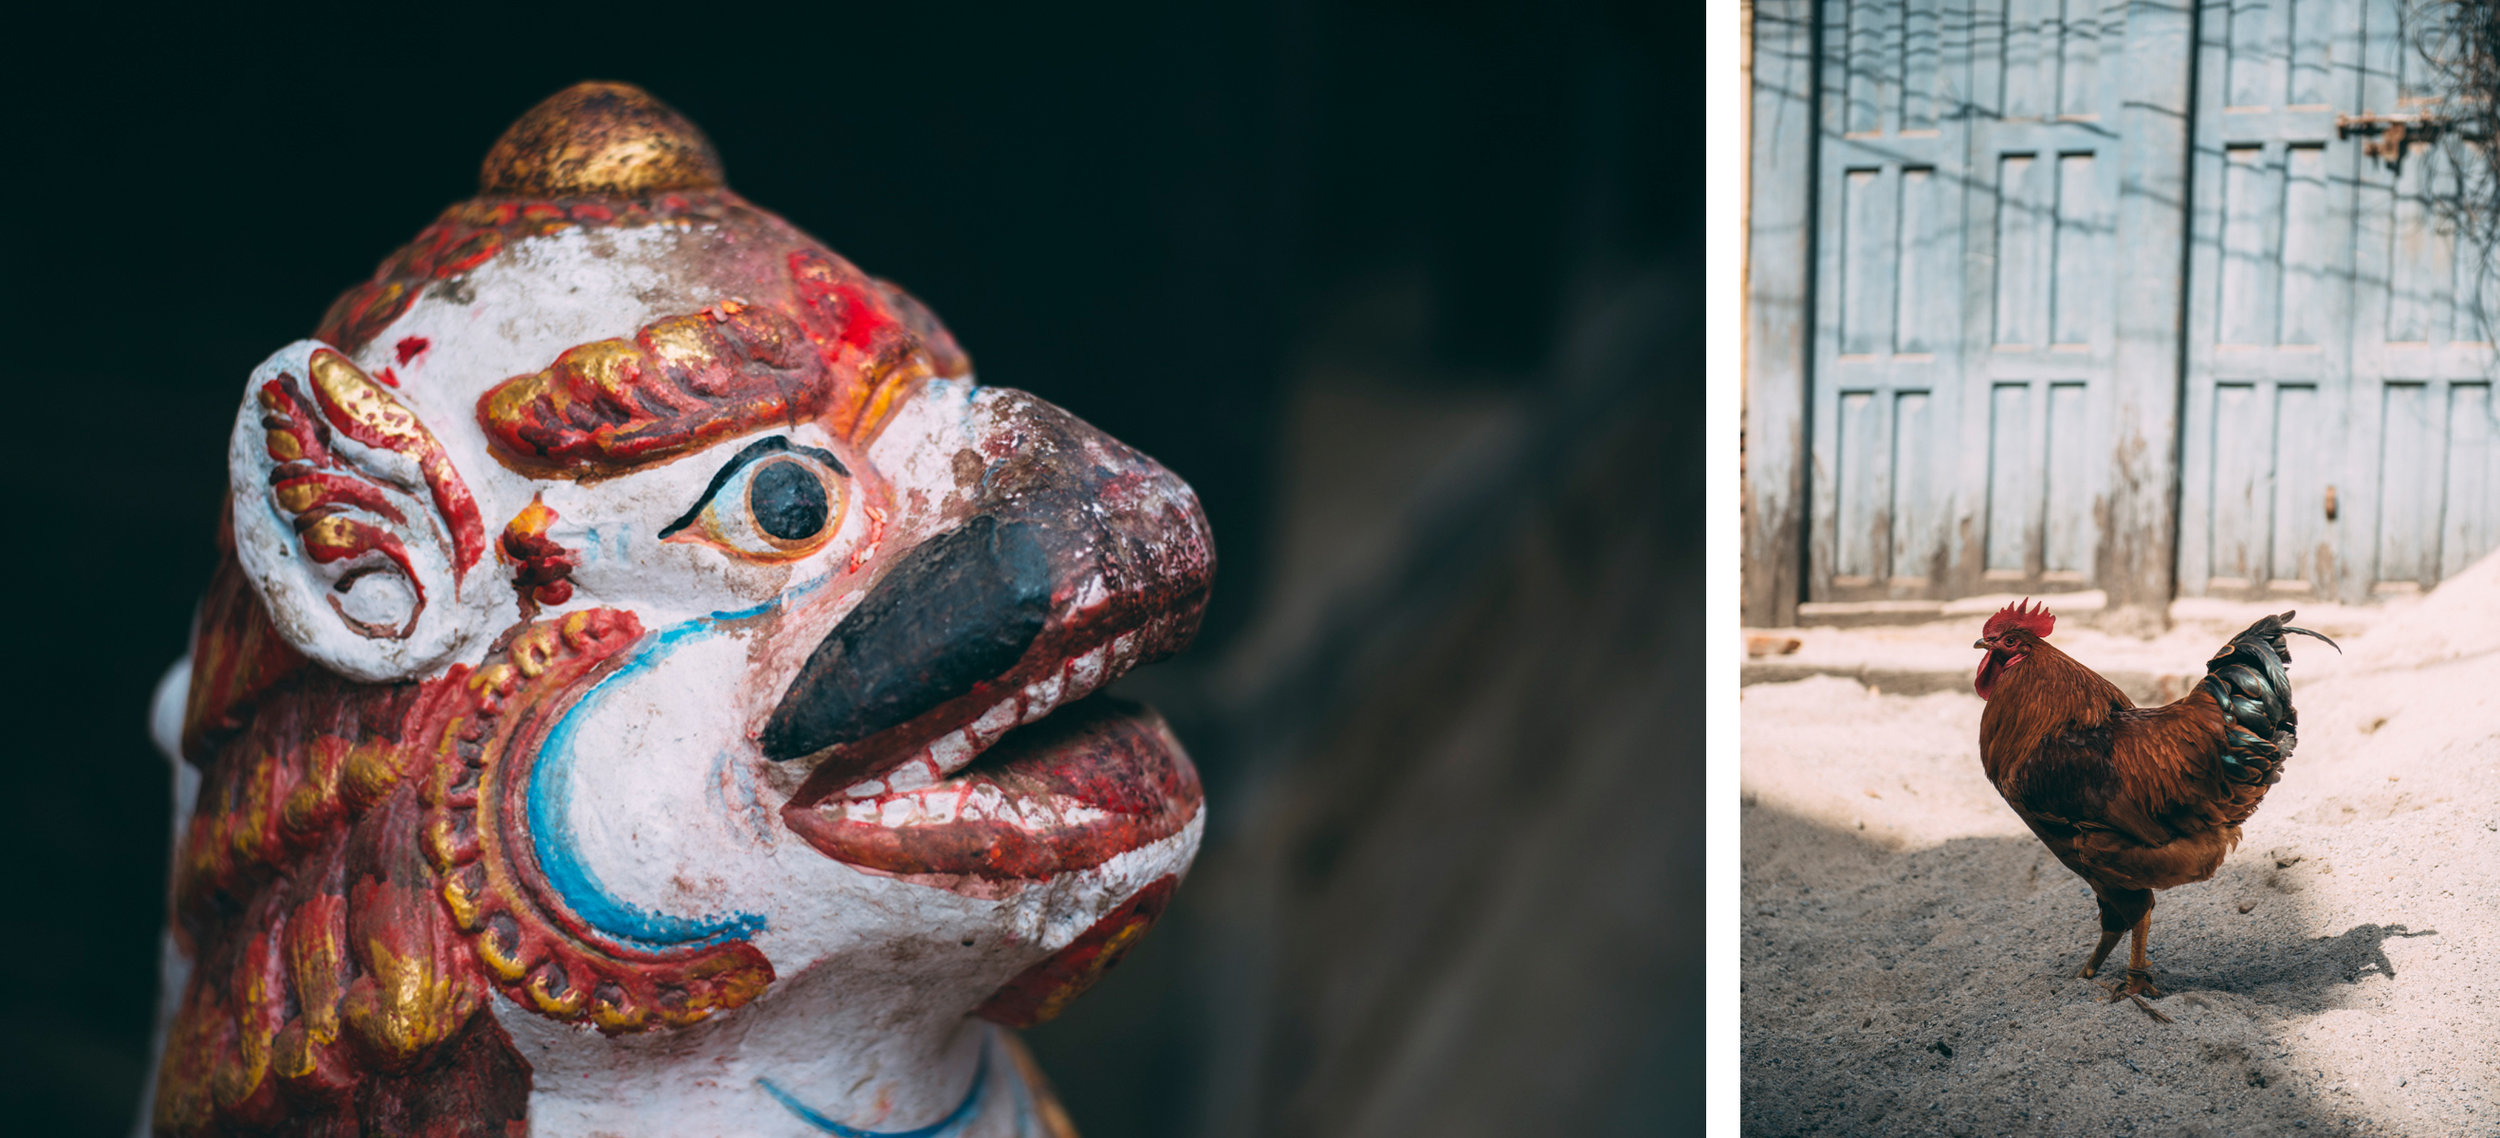 19-Nepal-Blog-Lola-Photography_001.jpg